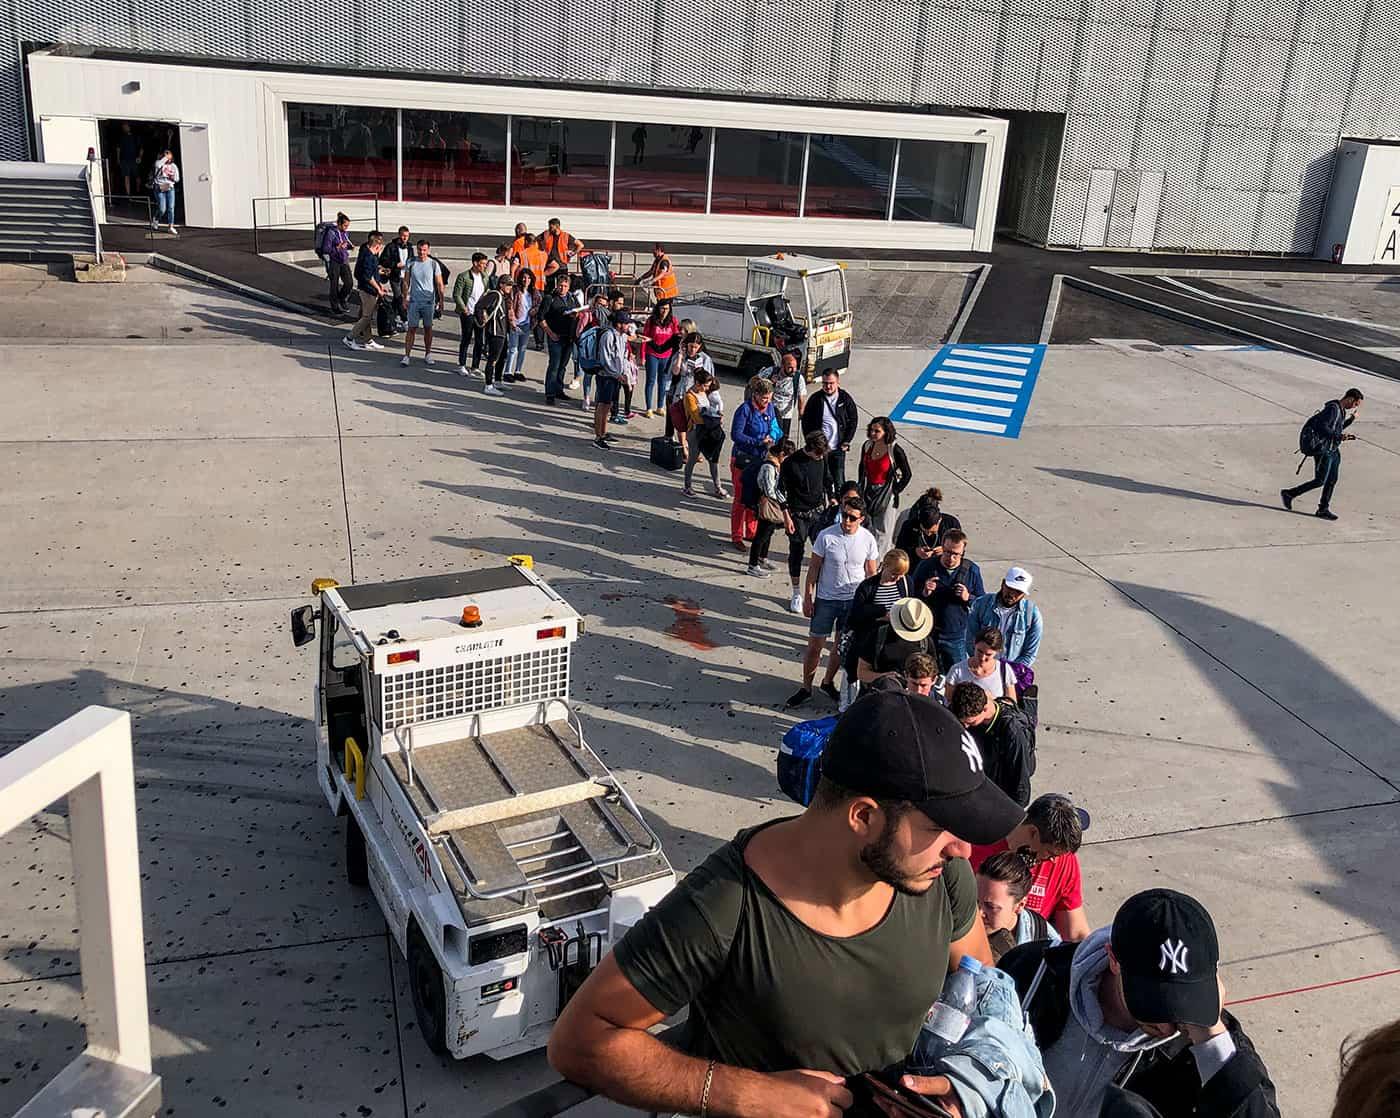 Lauda Boarding in Marseille